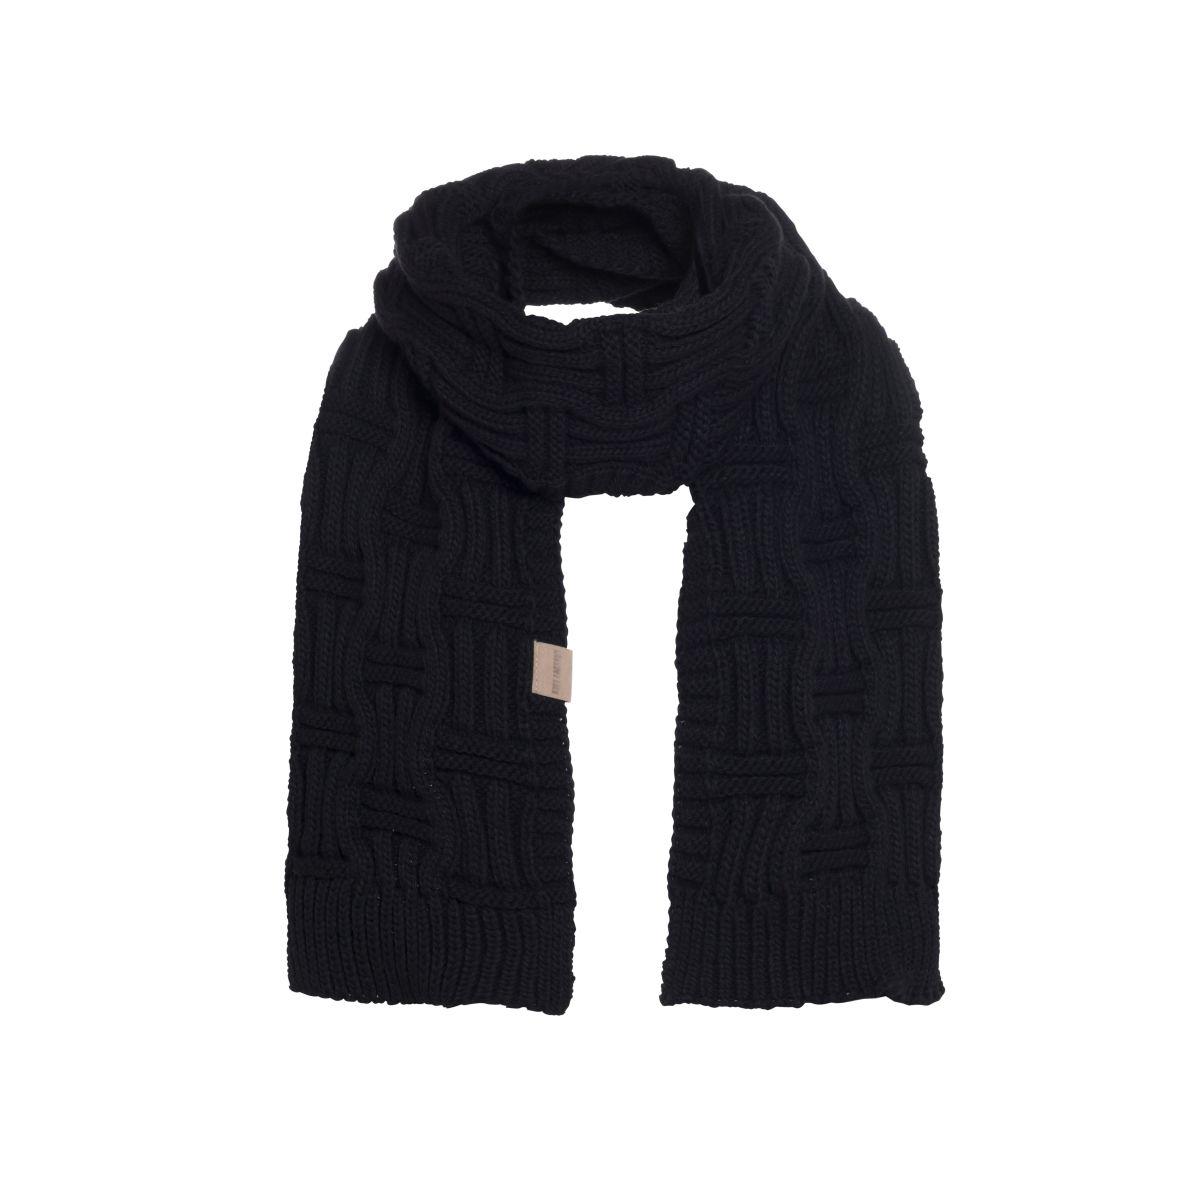 bobby scarf black